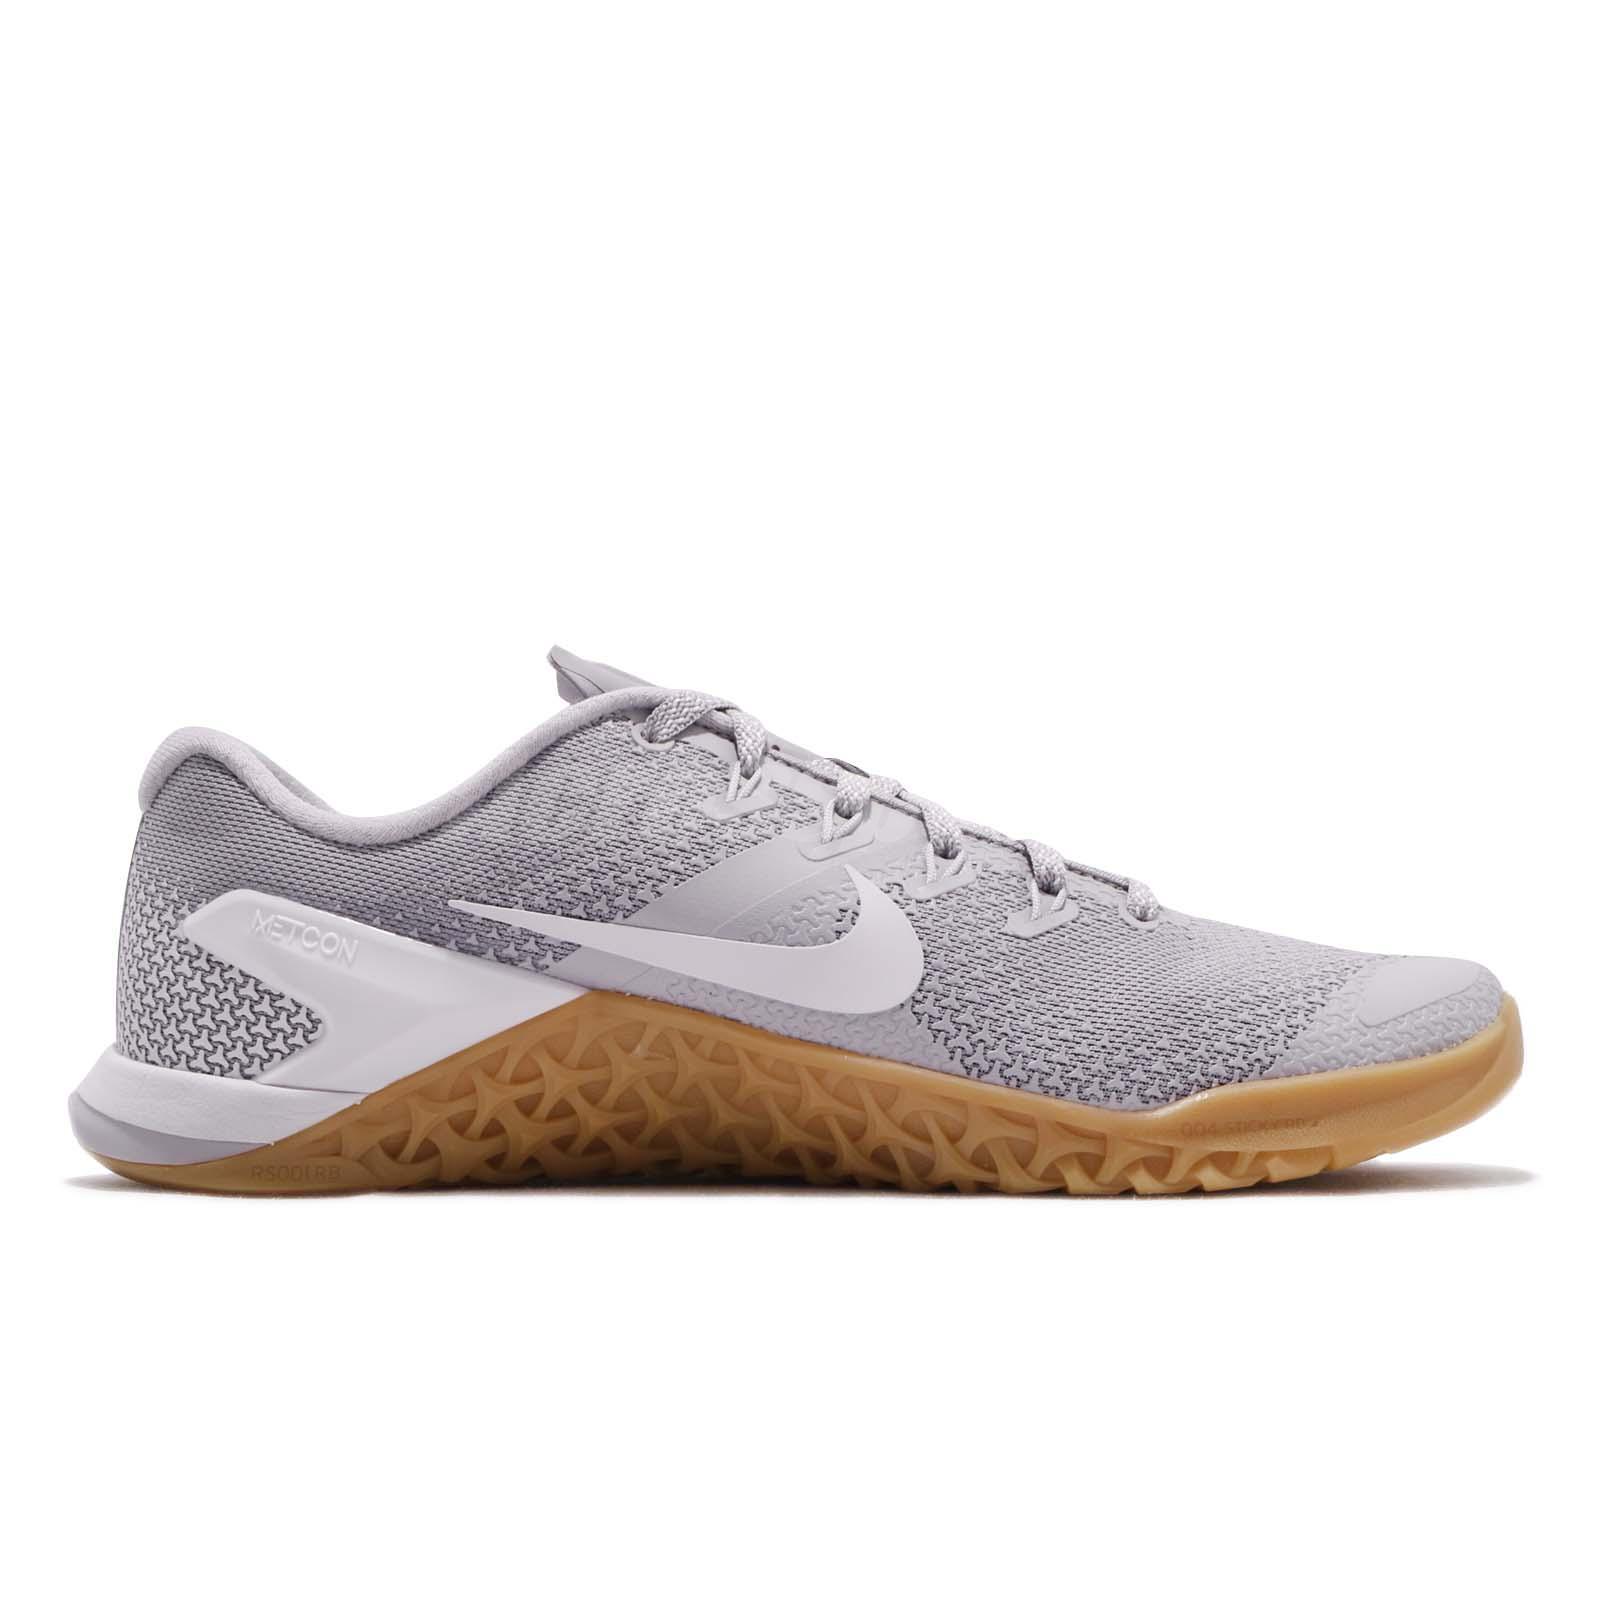 fb7913de0704 Nike Metcon 4 Atmosphere Vast Grey Gum Men Cross Training Shoes ...